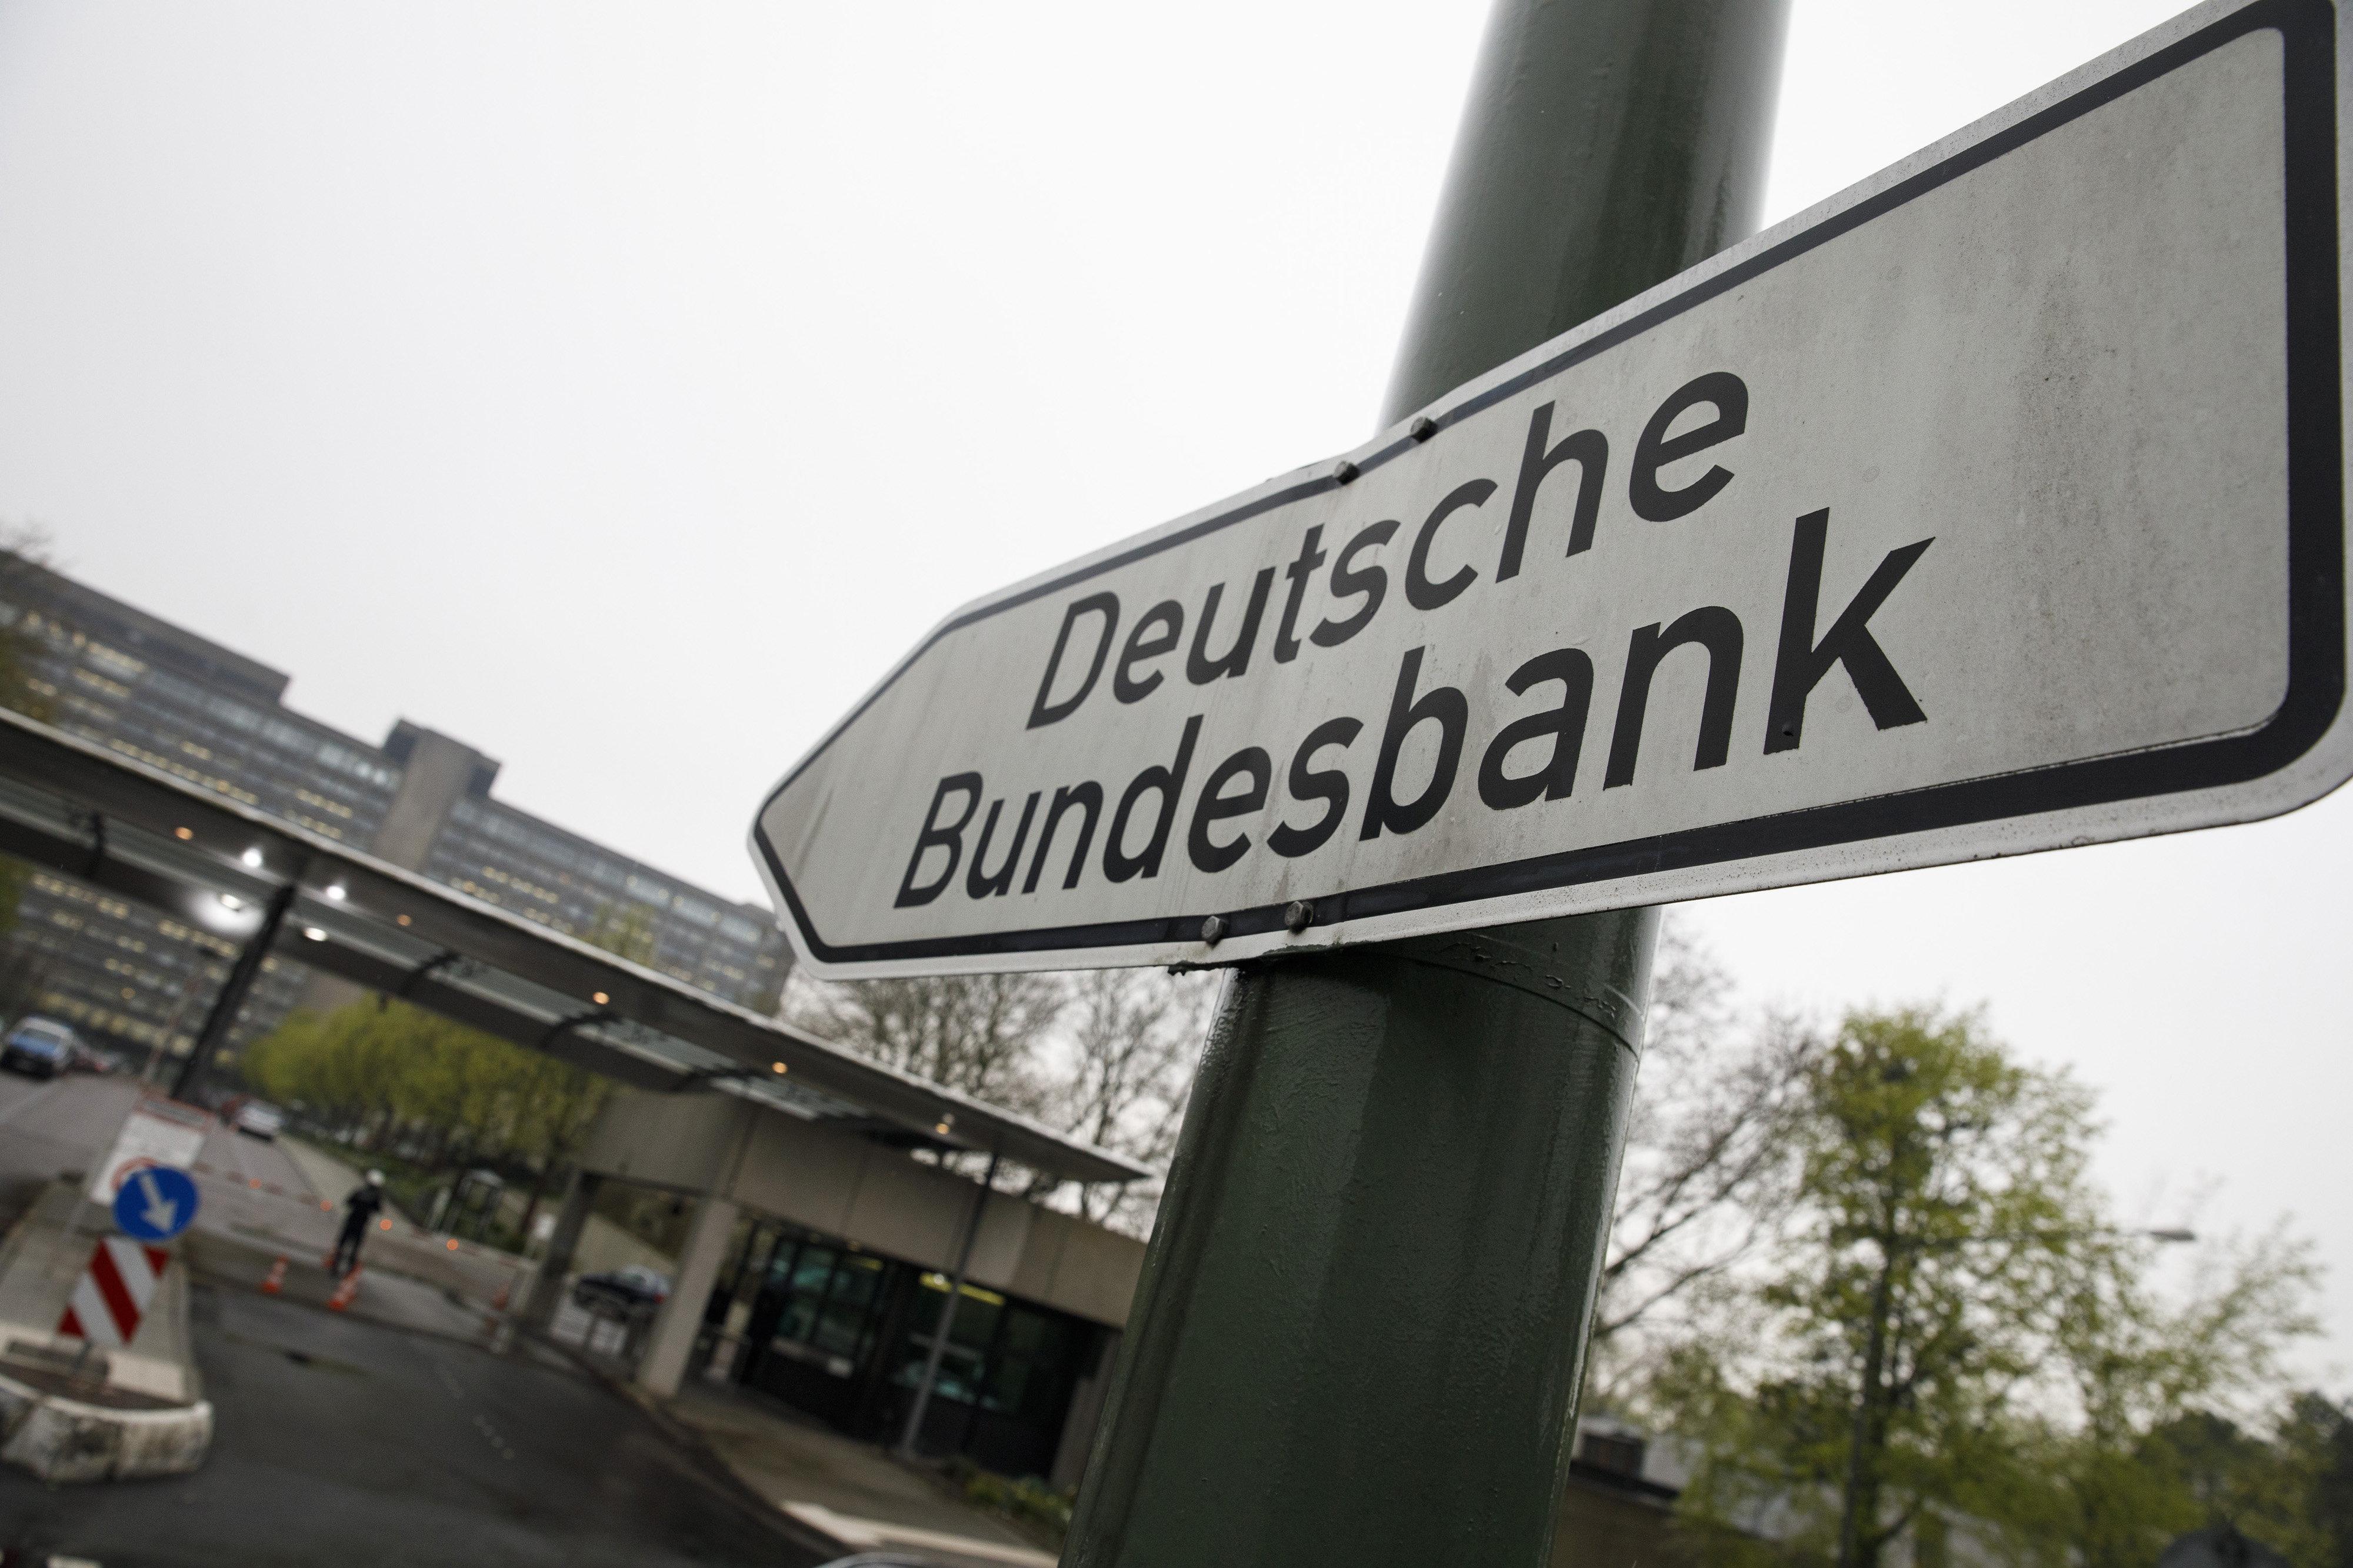 Bild: Η Bundesbank κέρδισε 3,4 δισ. ευρώ από τα ελληνικά κρατικά